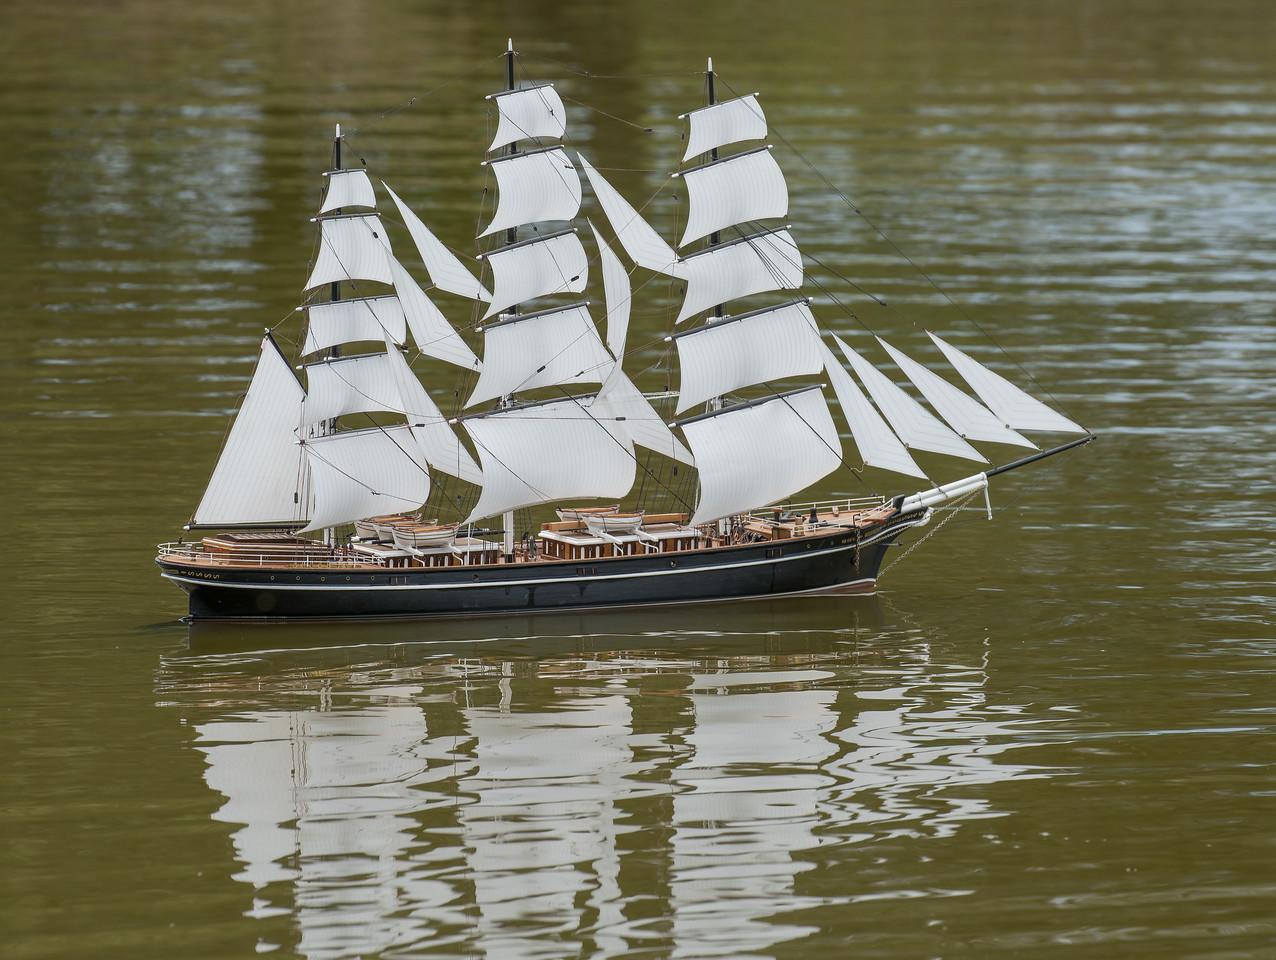 Black Adder, David Edwards, Navy Day 2017, SRCMBC, Setley Pond, Solent Radio Control Model Boat Club, clipper ship